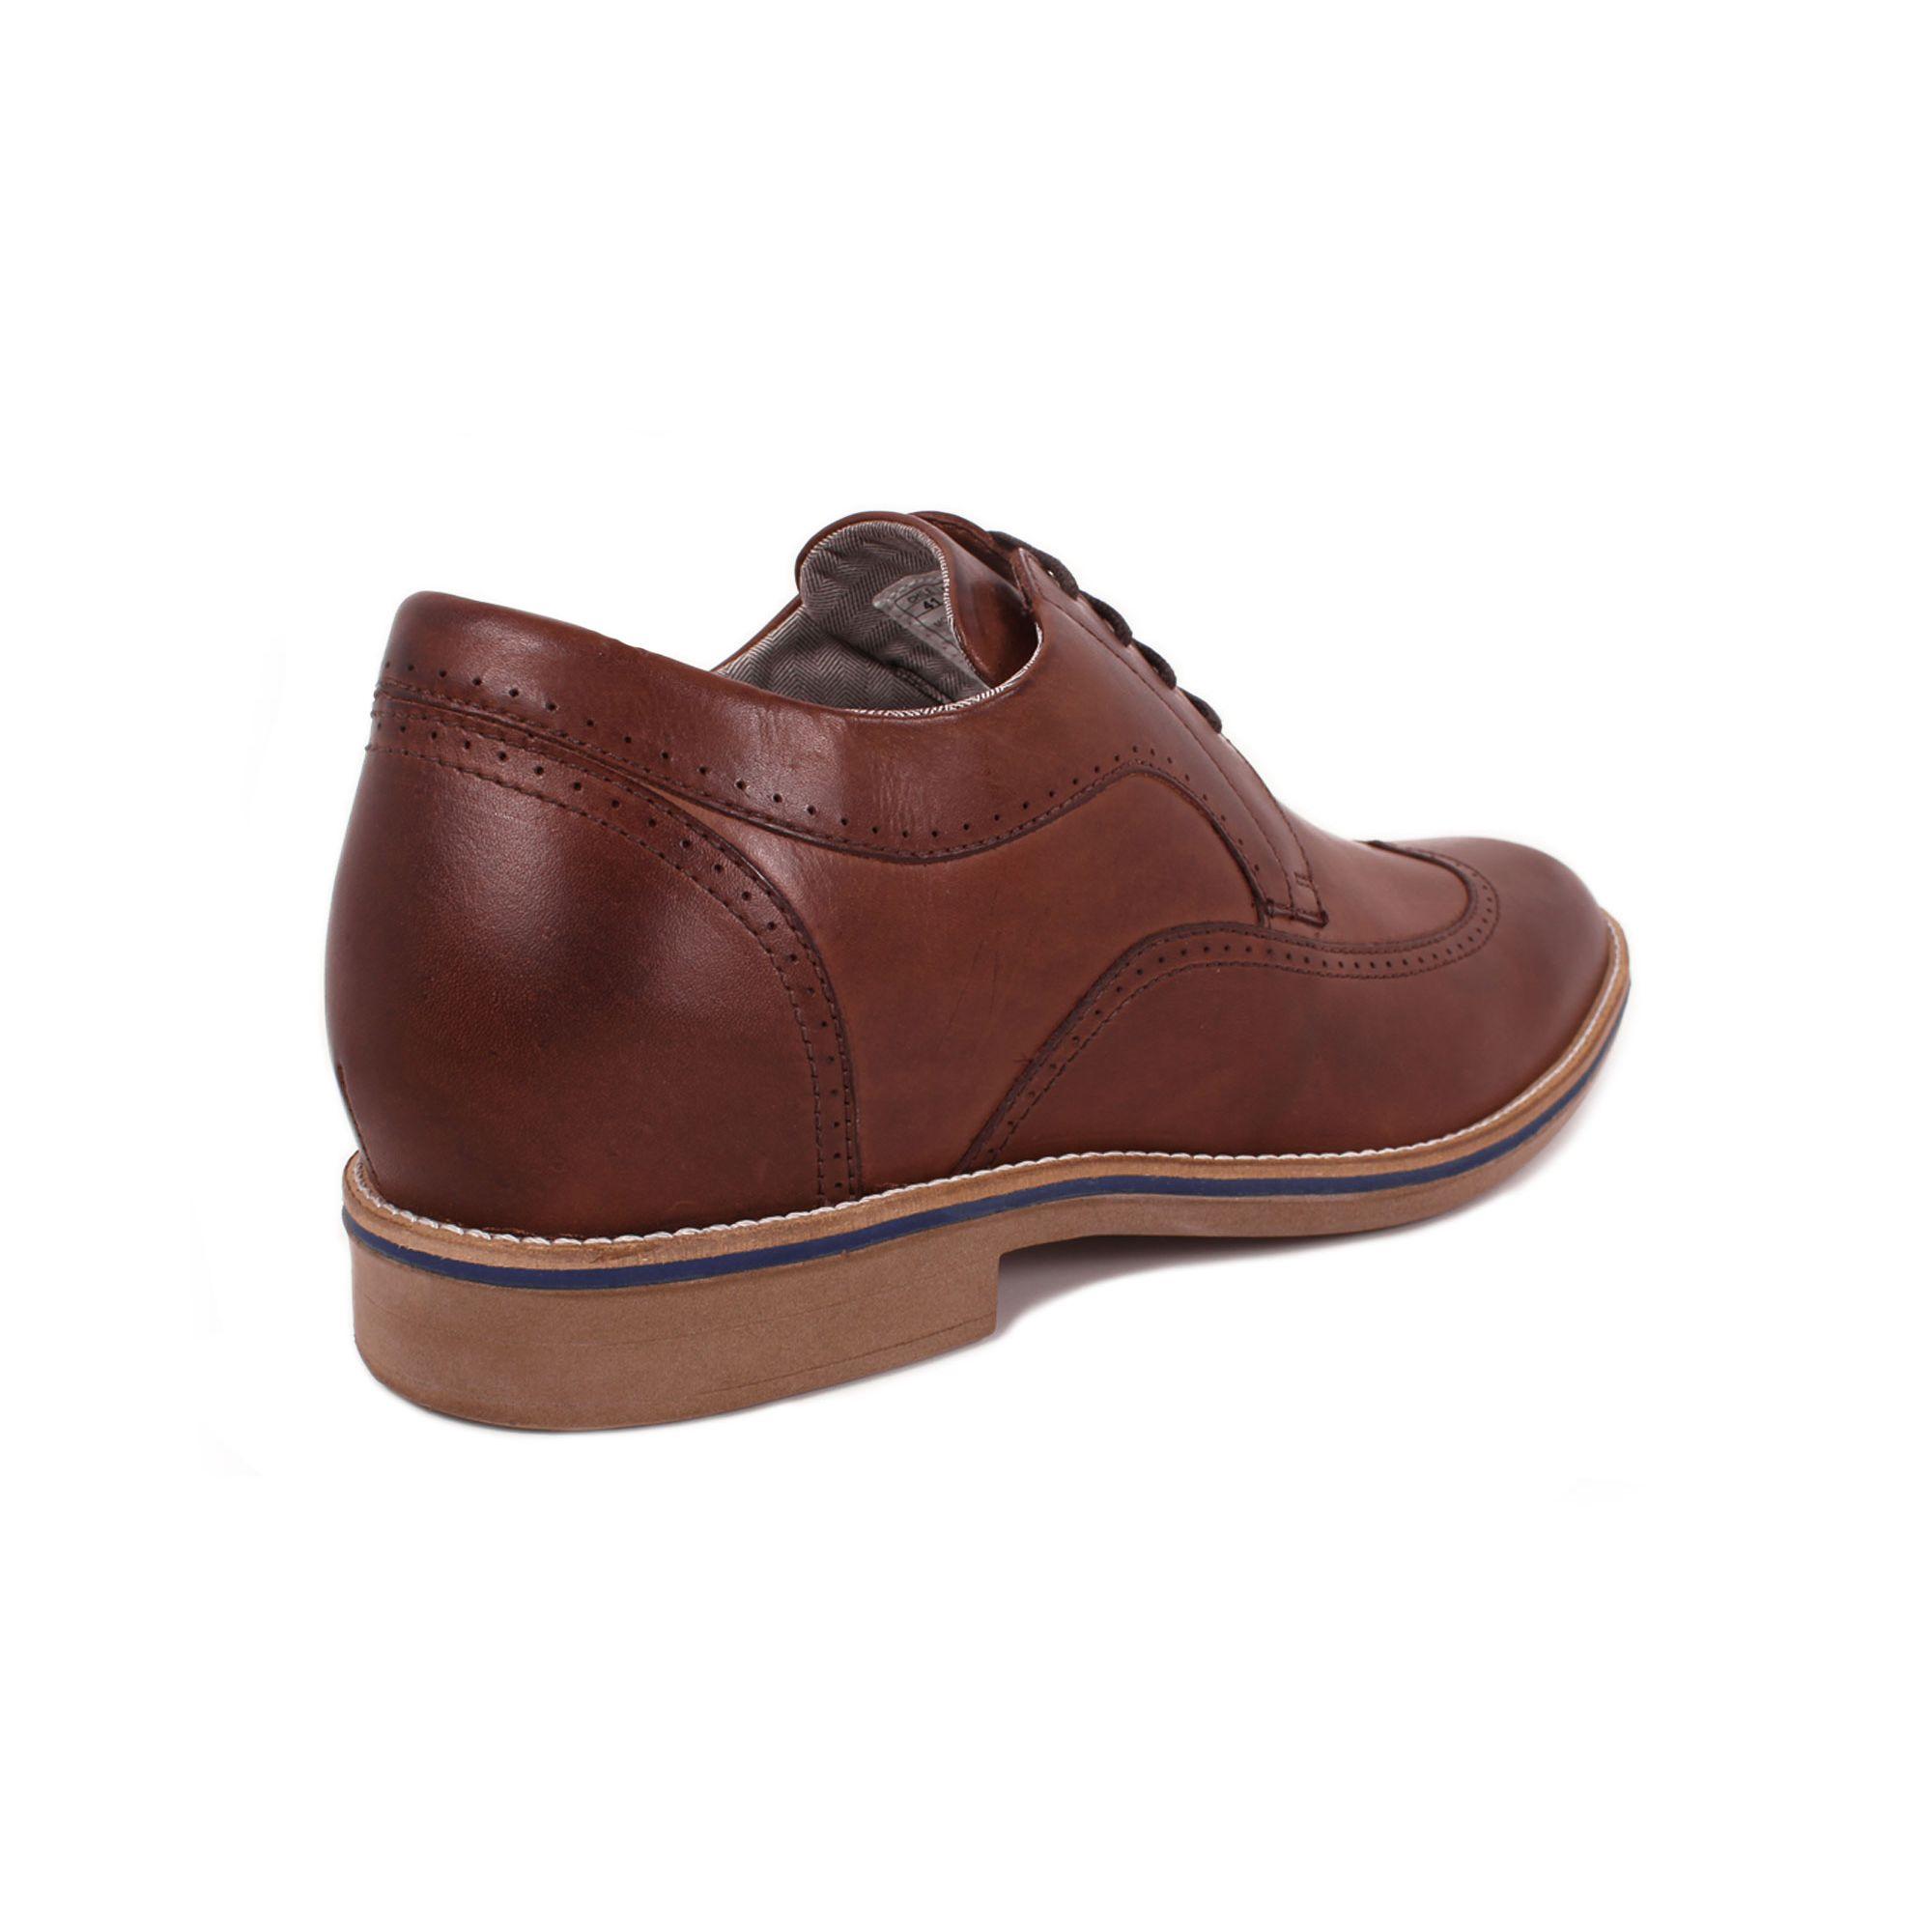 Zapato Casual Oxford Café Oscuro Max Denegri +7cm de Altura_71058